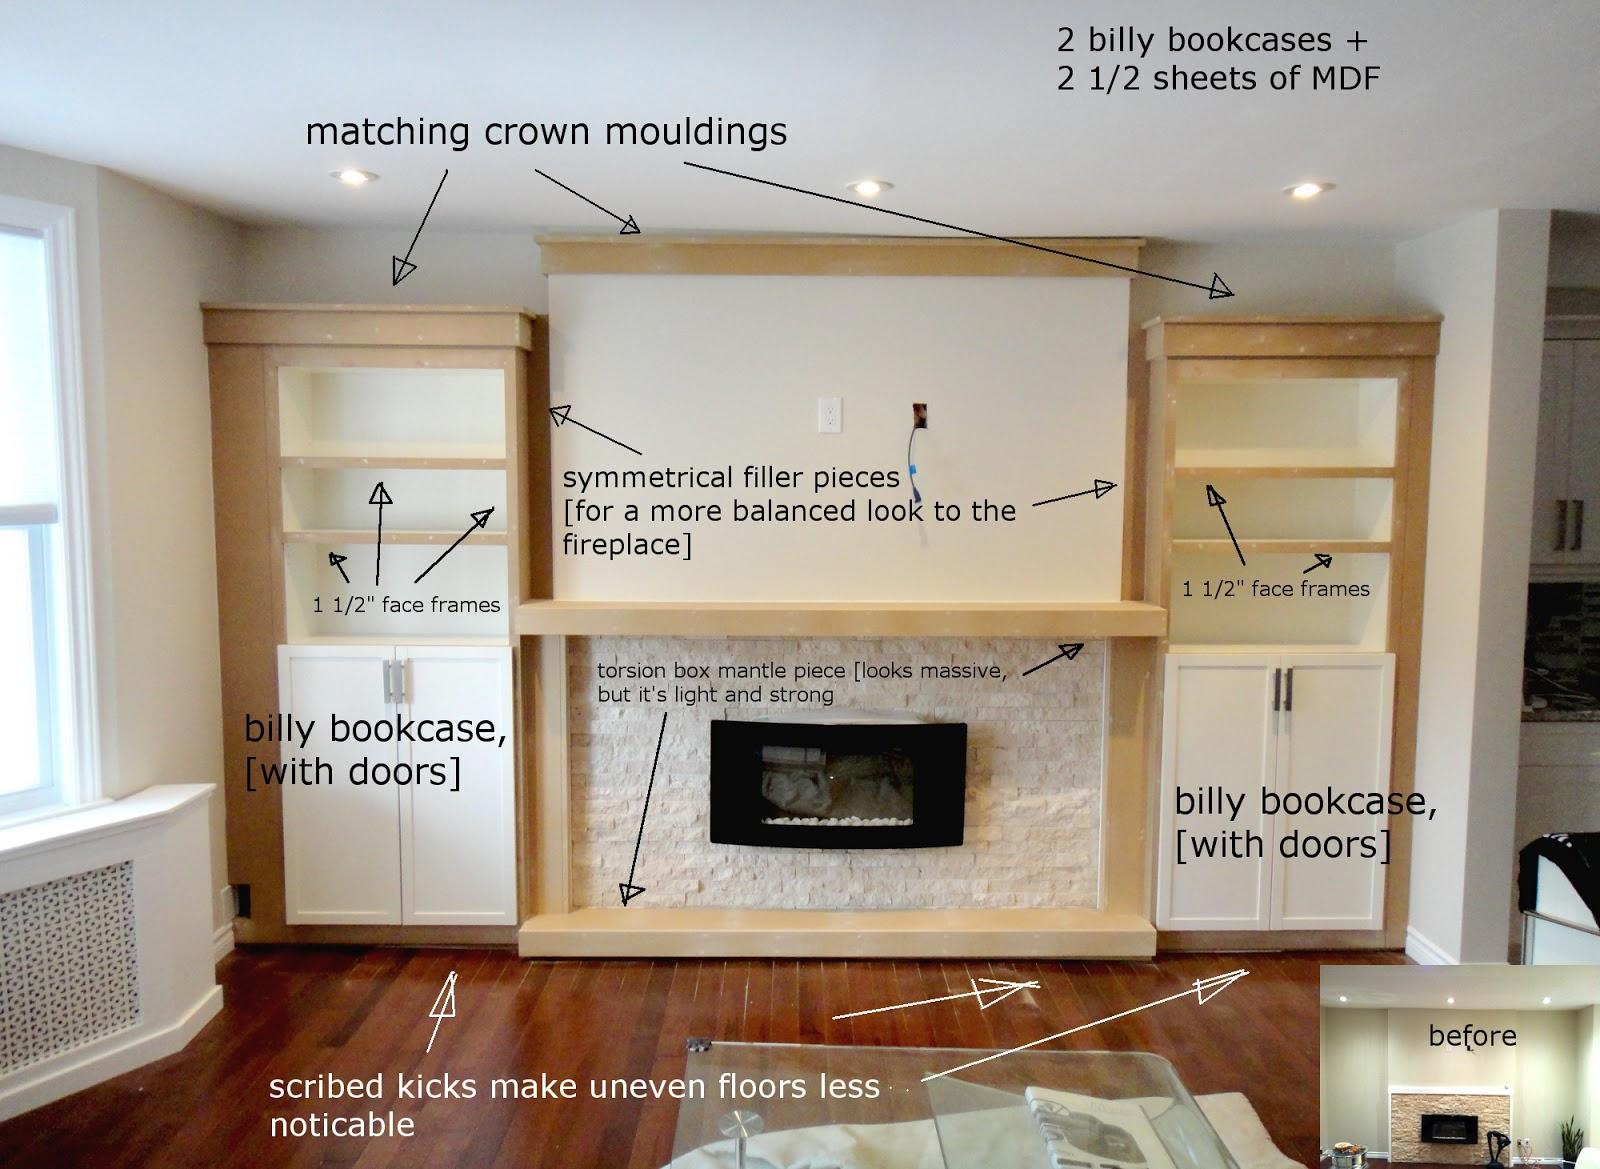 studio kosnik april 2013. Black Bedroom Furniture Sets. Home Design Ideas